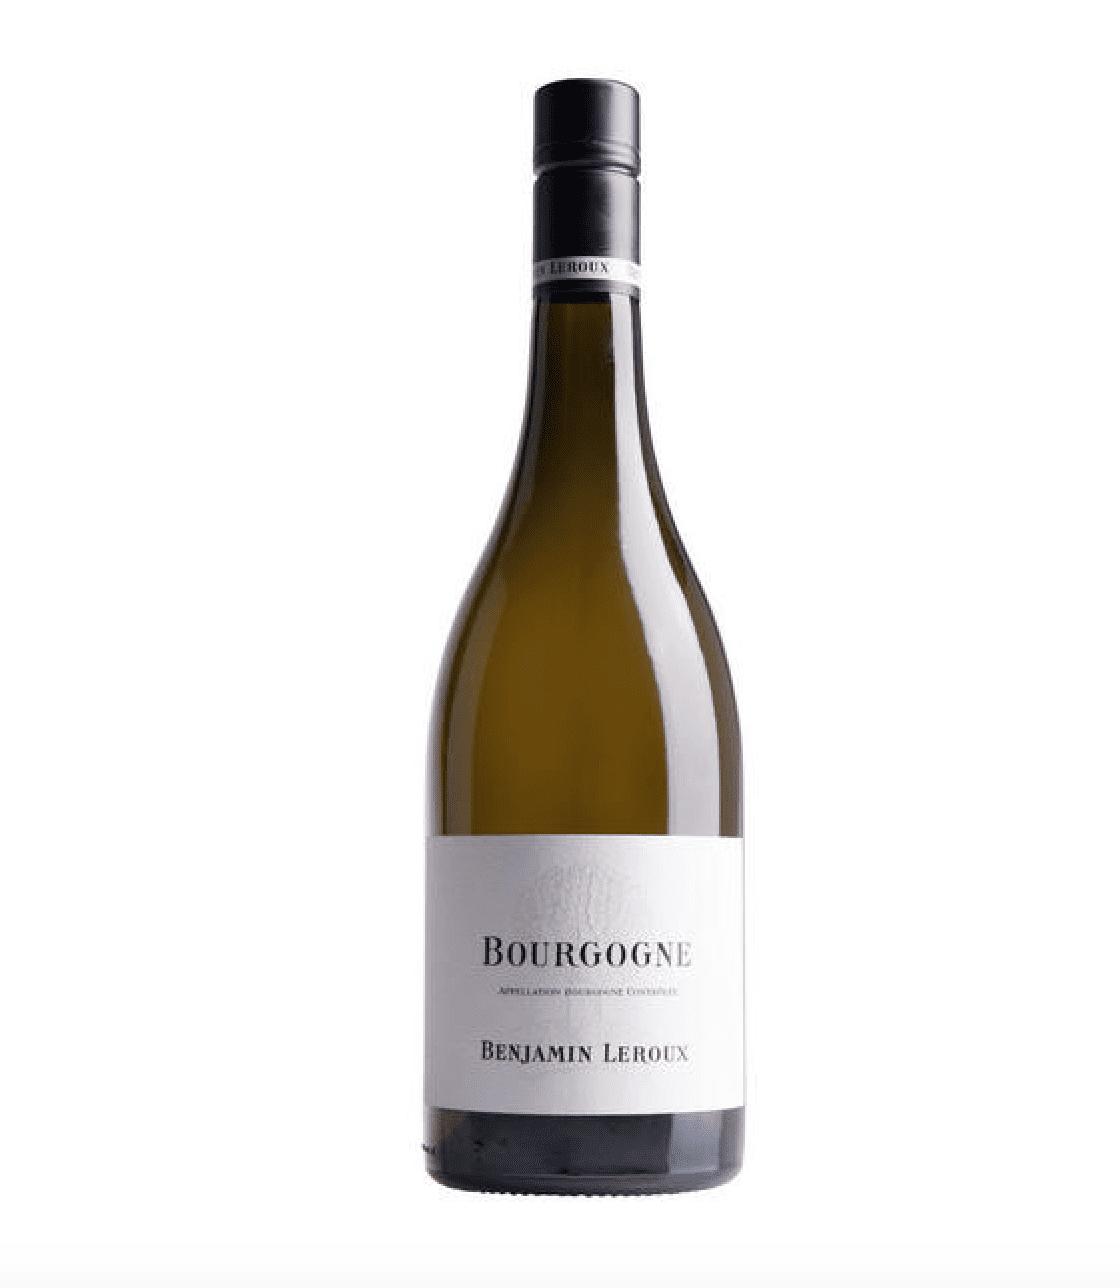 Bourgogne blanc 2017 – Benjamin Leroux